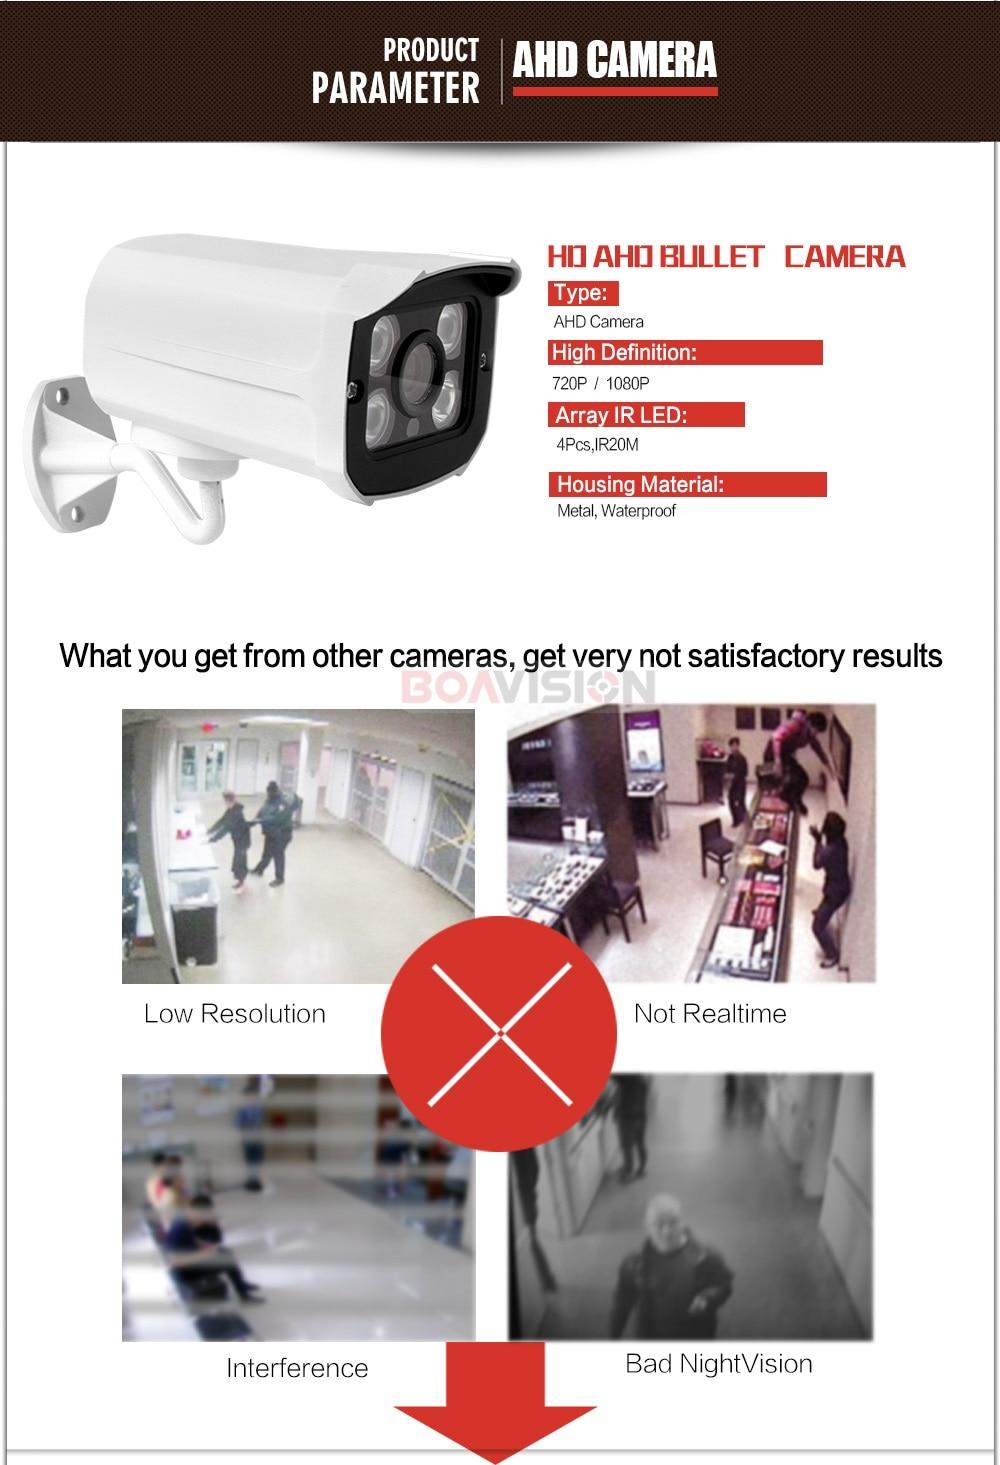 03 720P AHD Camera